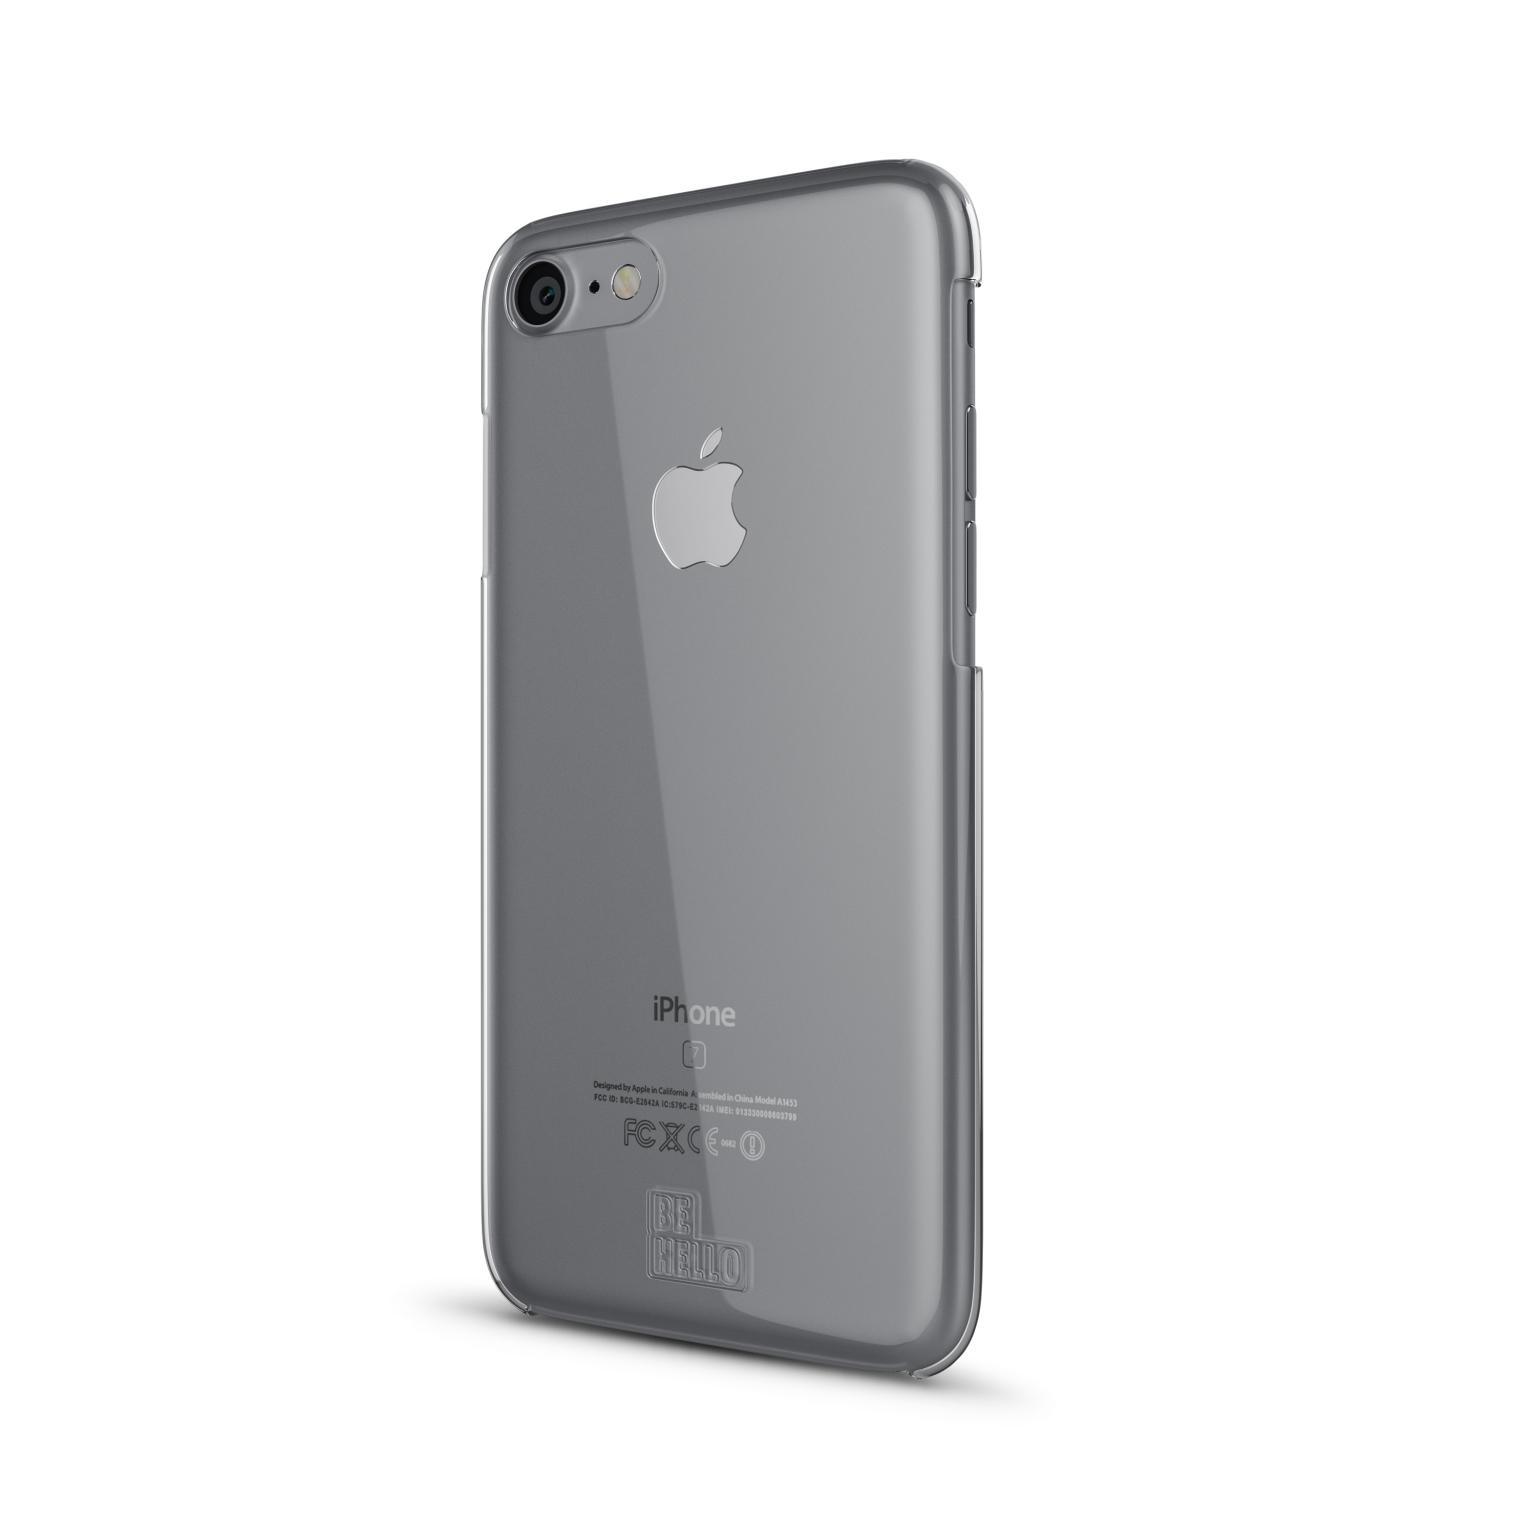 Afbeelding van BeHello iPhone 7 / 6S 6 Transparent Back Case Anti Scratch Transpare